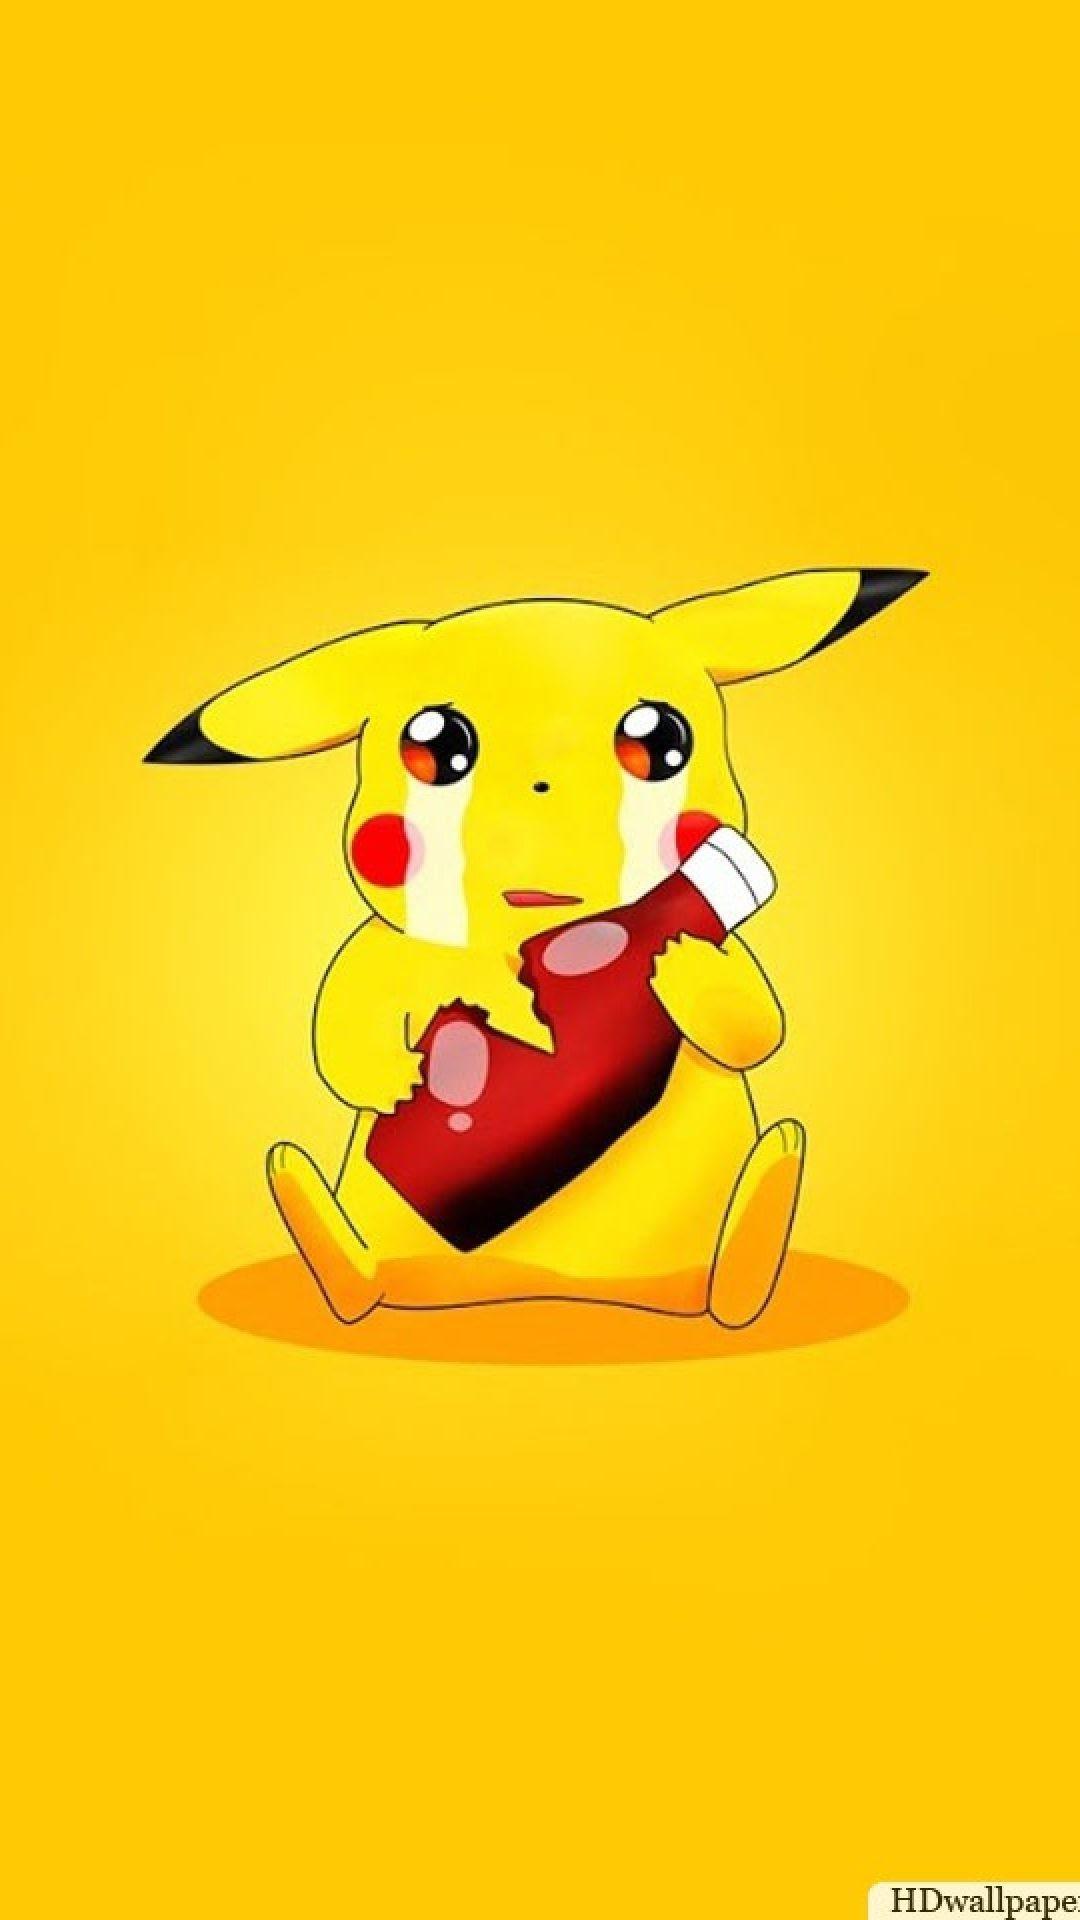 Download 500 Wallpaper Pikachu HD Paling Keren